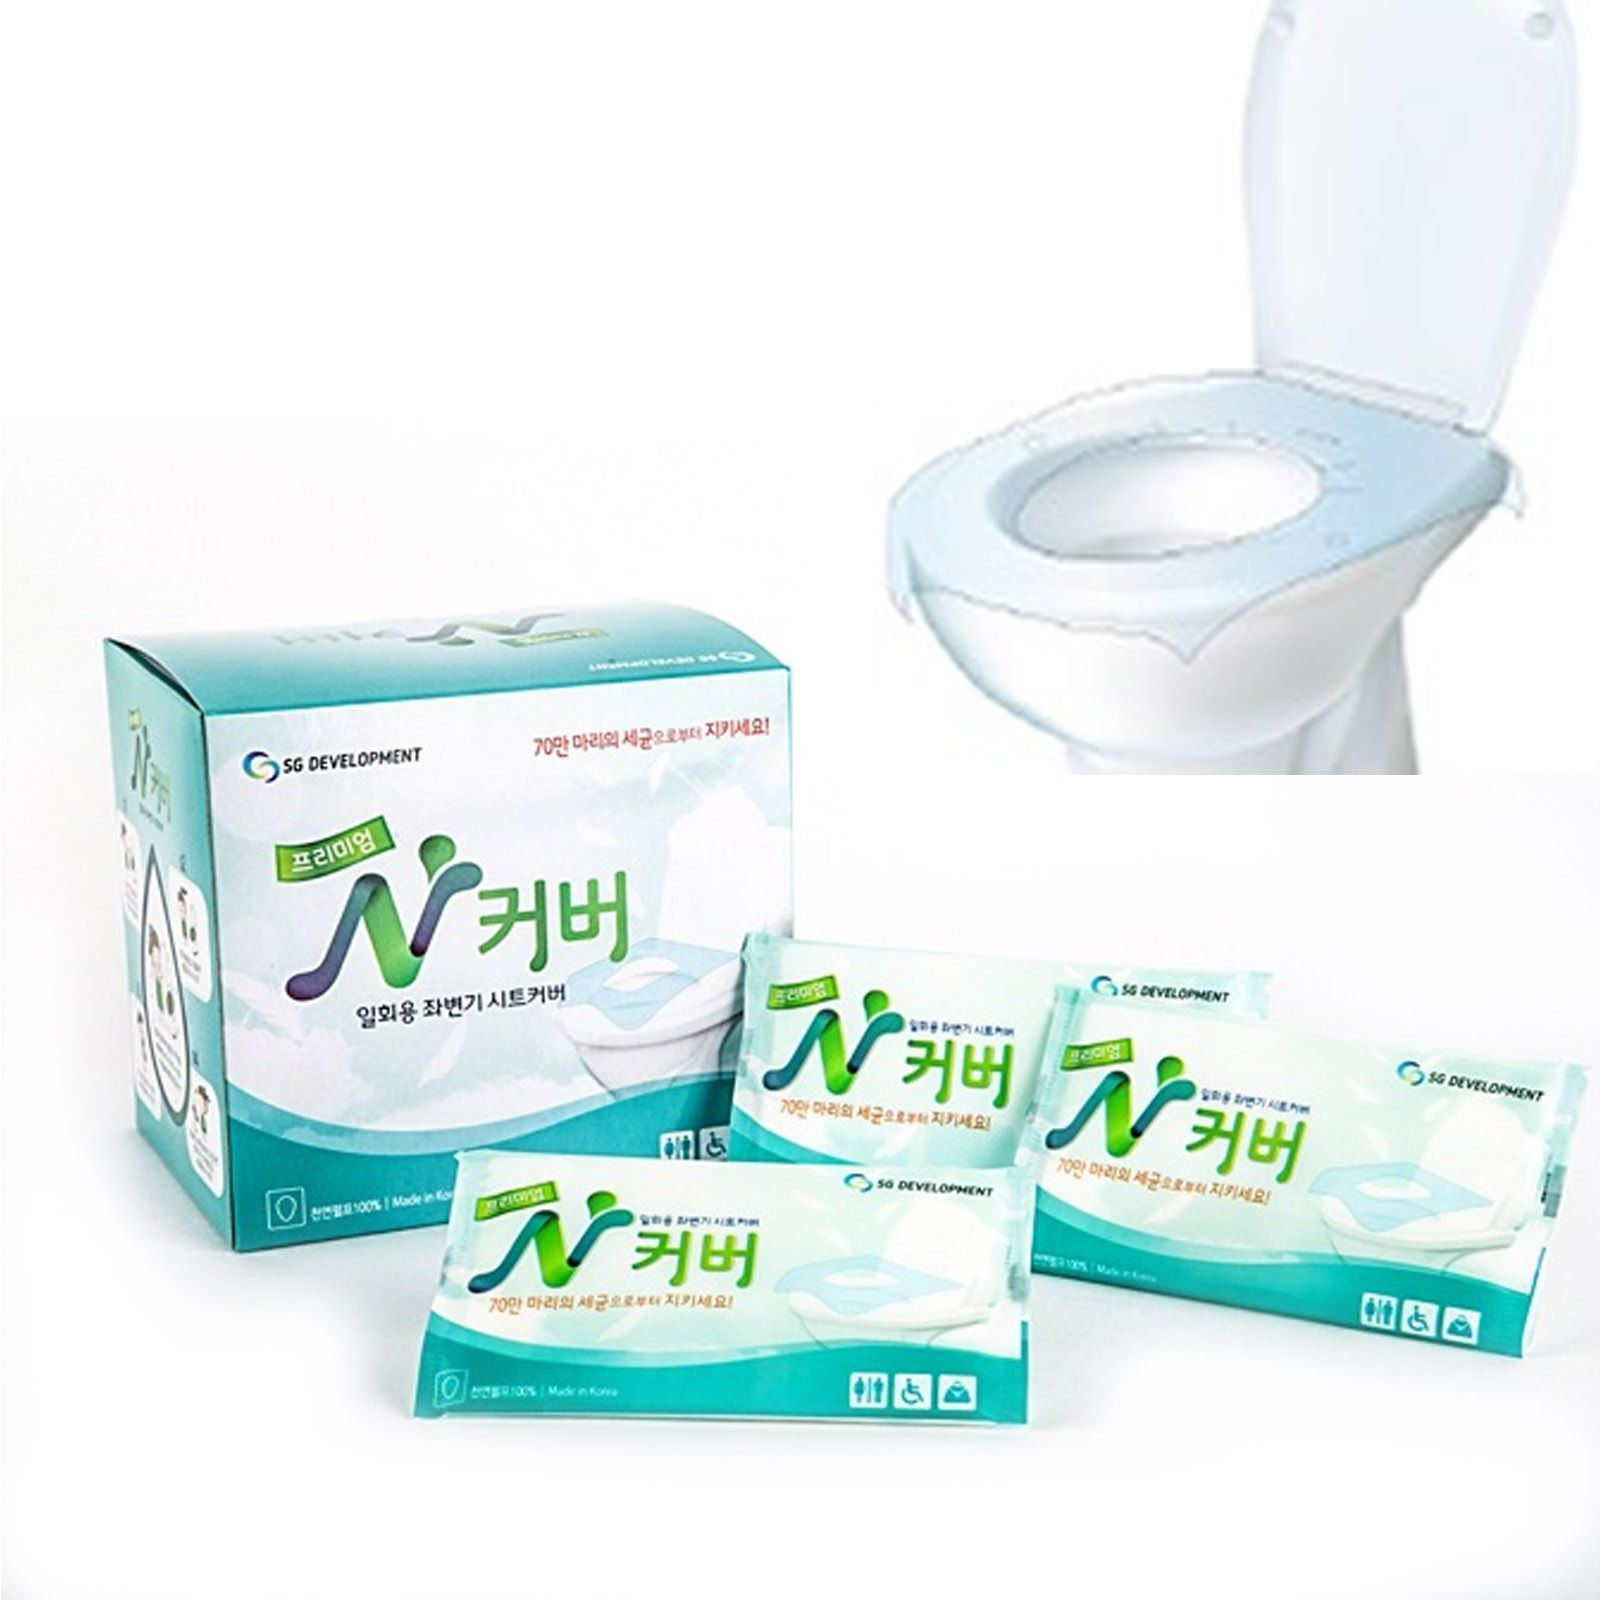 Pleasant N Cover Disposable Toilet Seat Covers 100 Pcs Travel Natural Machost Co Dining Chair Design Ideas Machostcouk